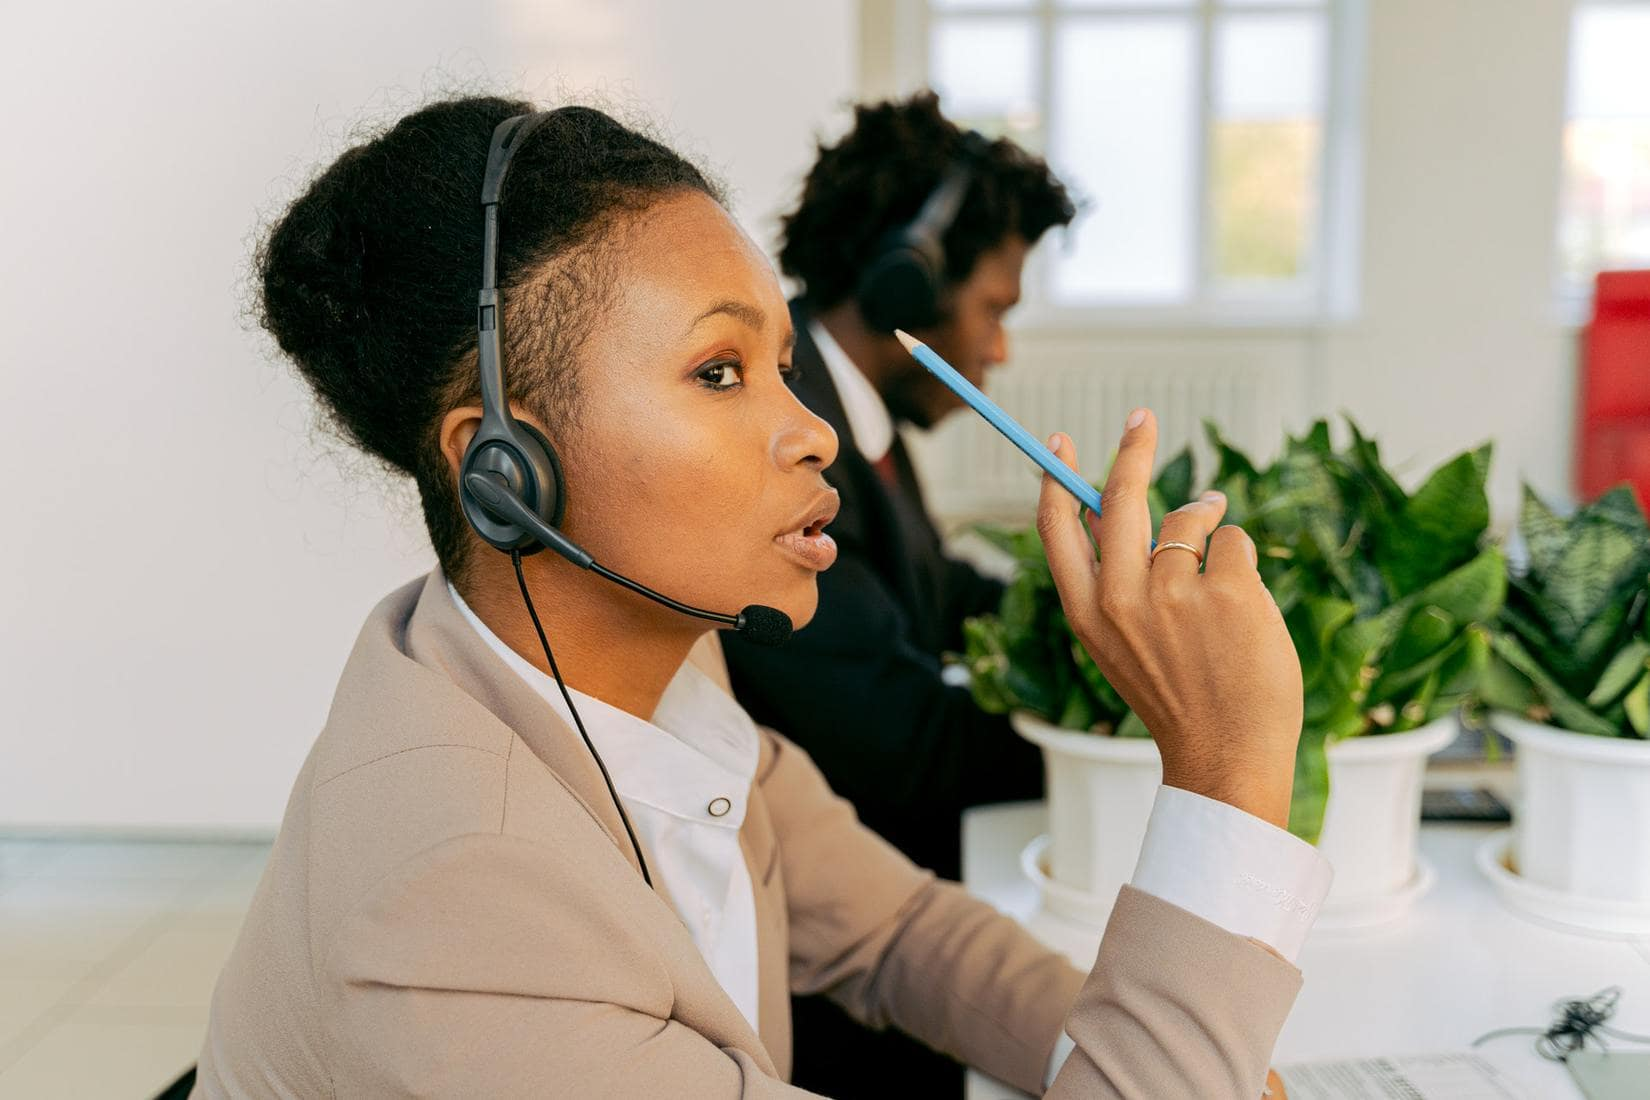 Customer support agent speaking